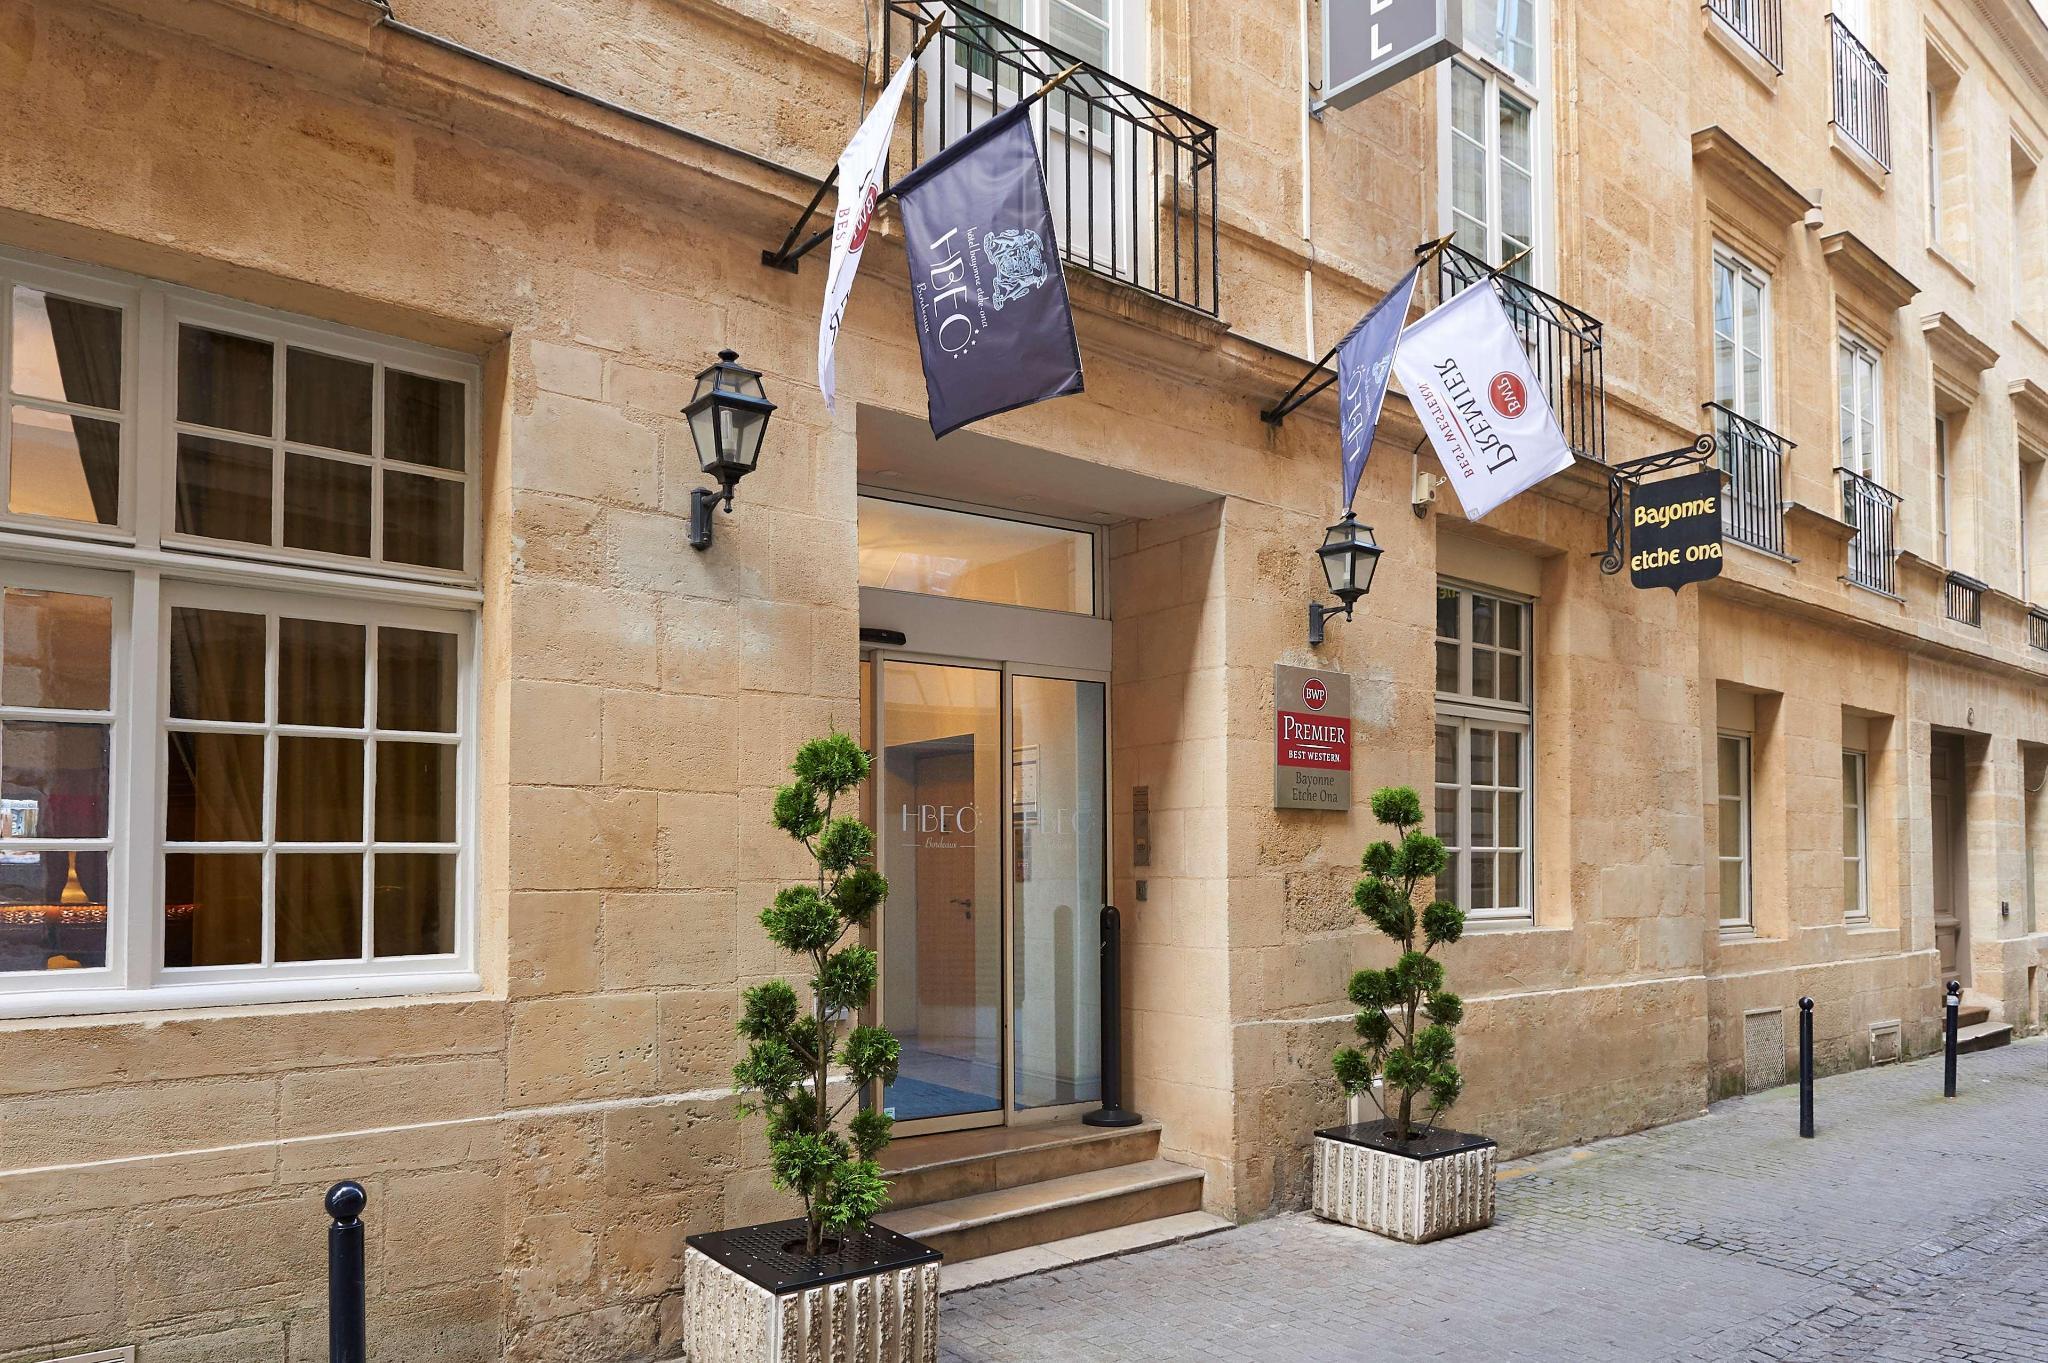 Best Western Hotel Room: Rooms In Best Western Premier Bordeaux Bayonne Etche Ona